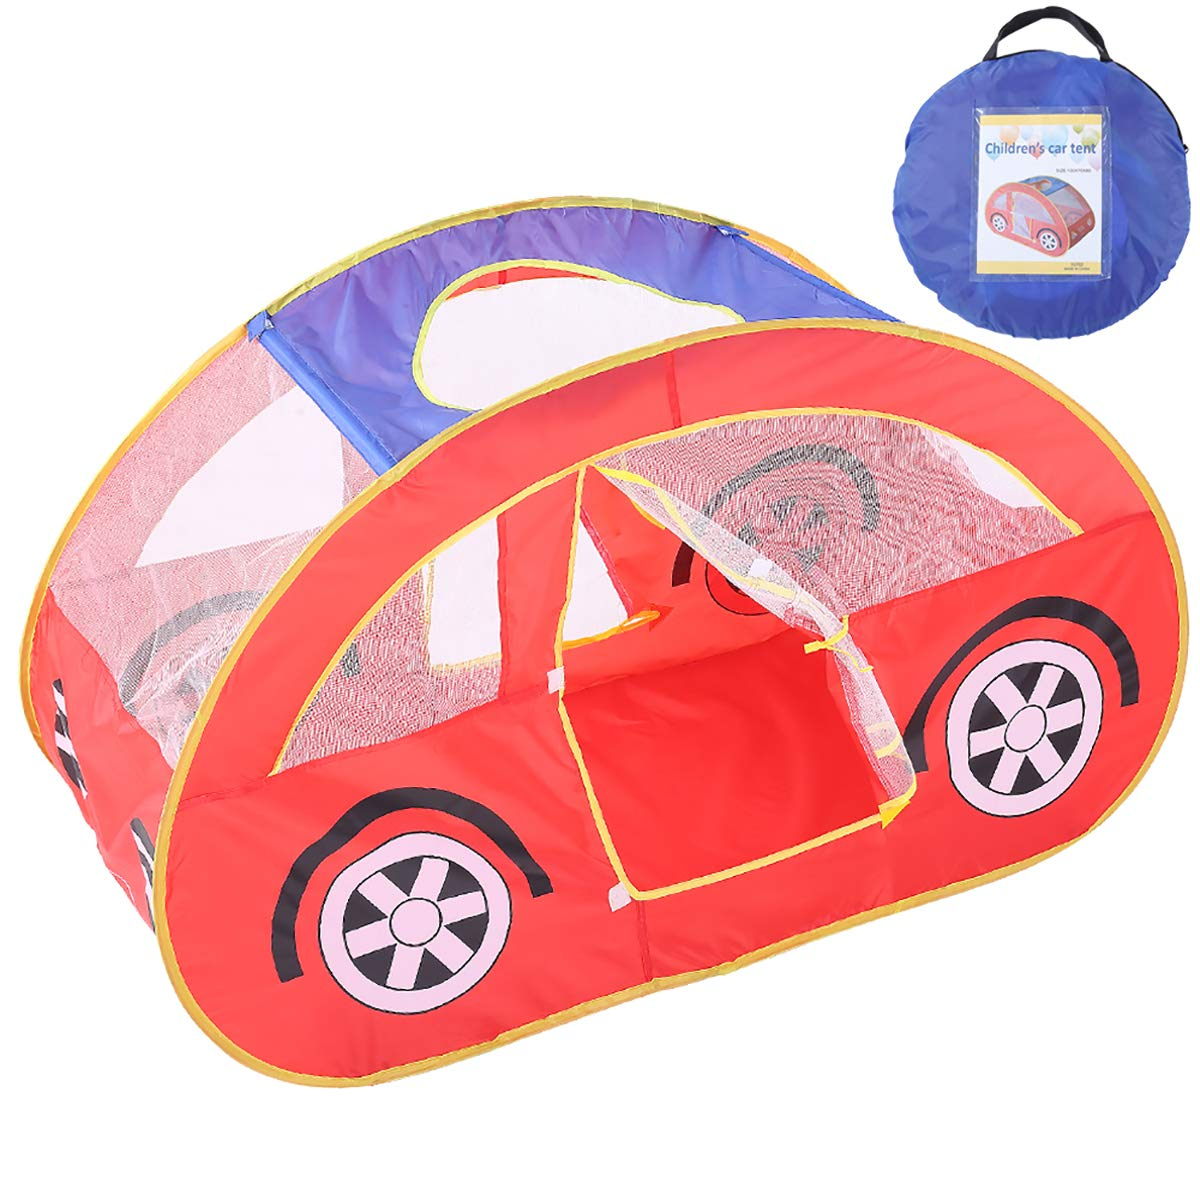 LQUYY 子供用 プレイテント 男の子 ゲーム 折りたたみ式 キャッスル 赤 海 波 ボール プール 赤 車 おもちゃ ハウス B07HQ7YLBR